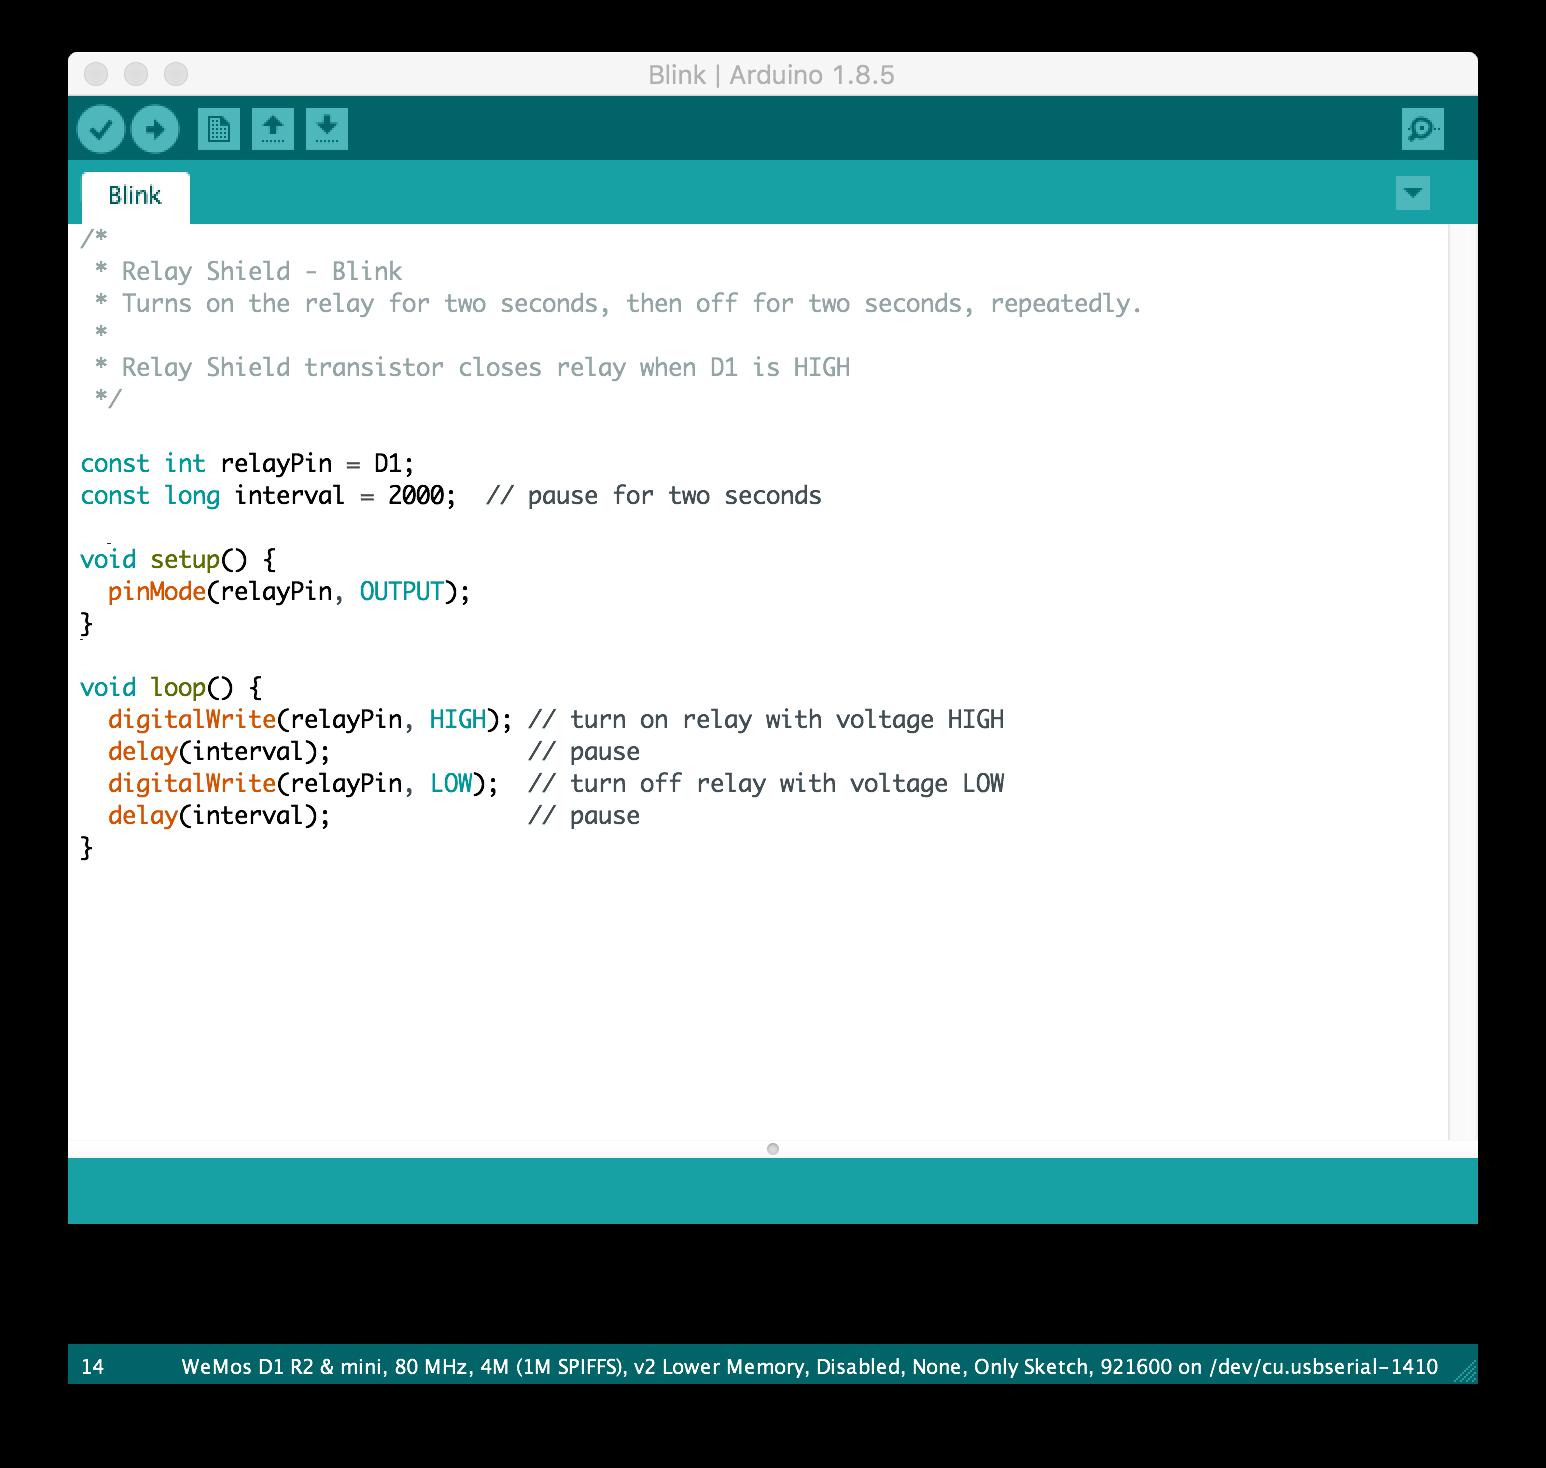 Come programmare un ESP8266